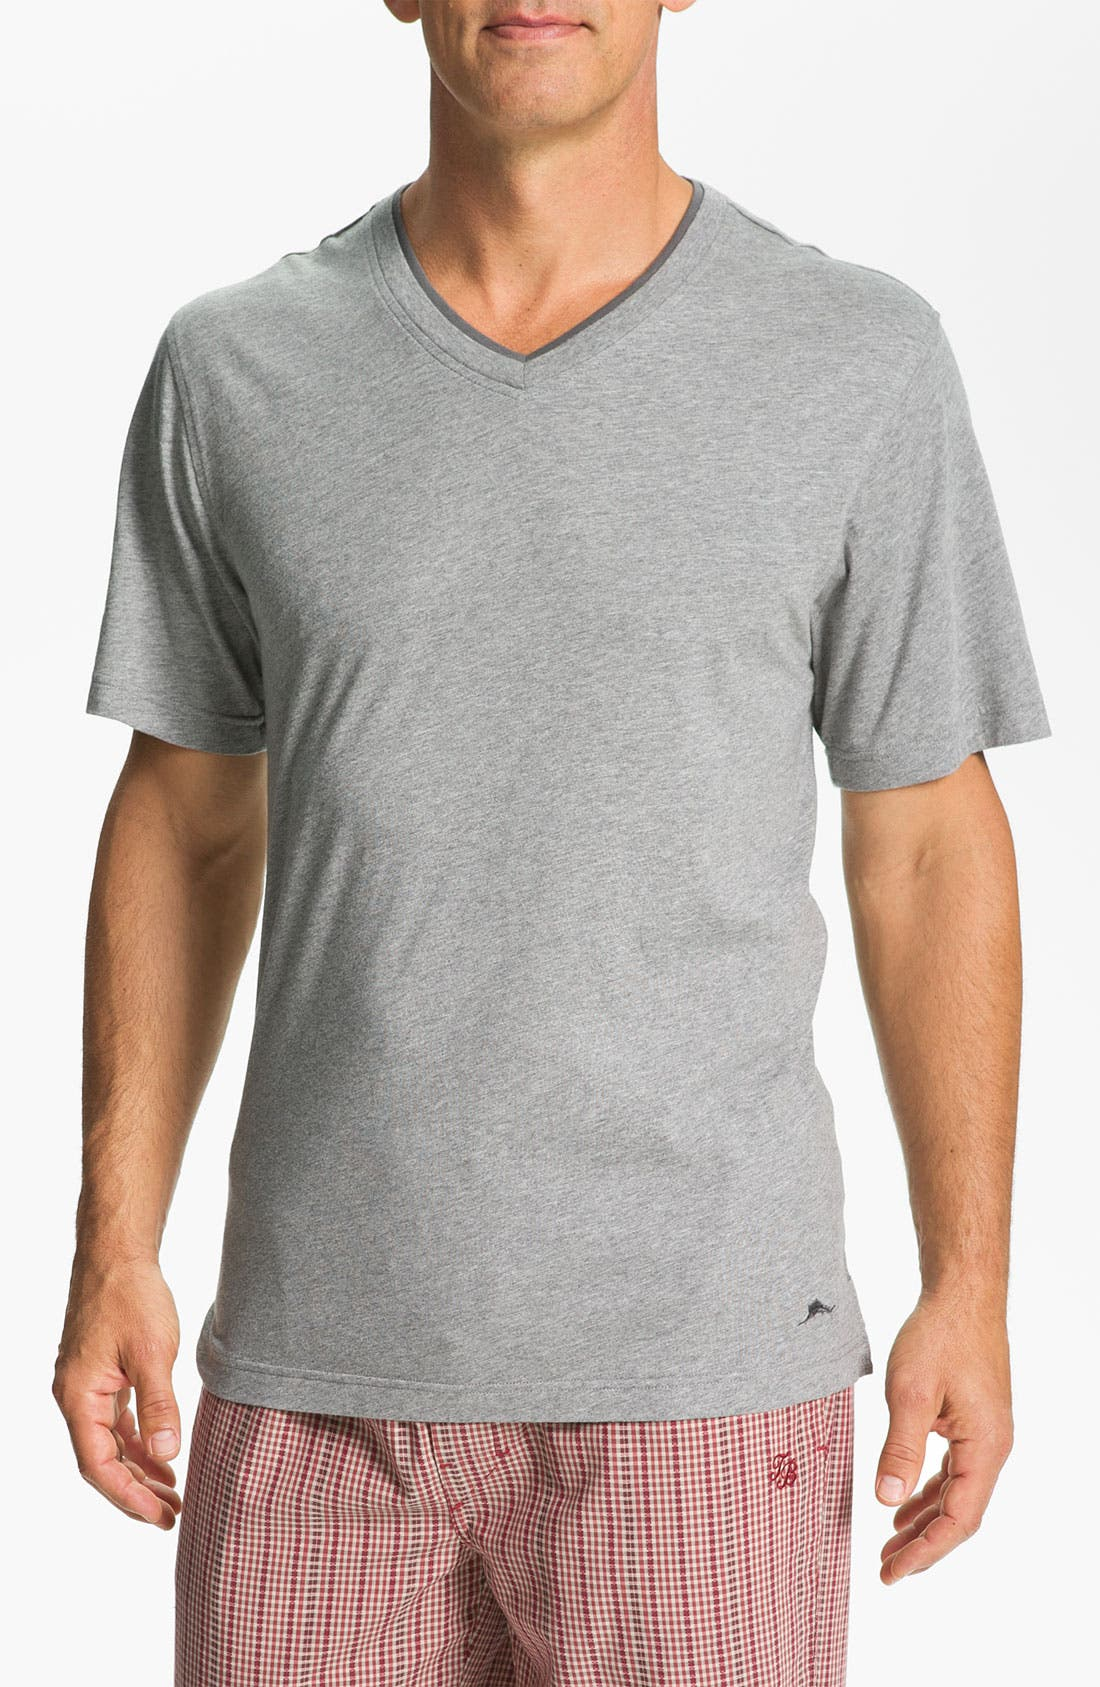 Alternate Image 1 Selected - Tommy Bahama V-Neck T-Shirt